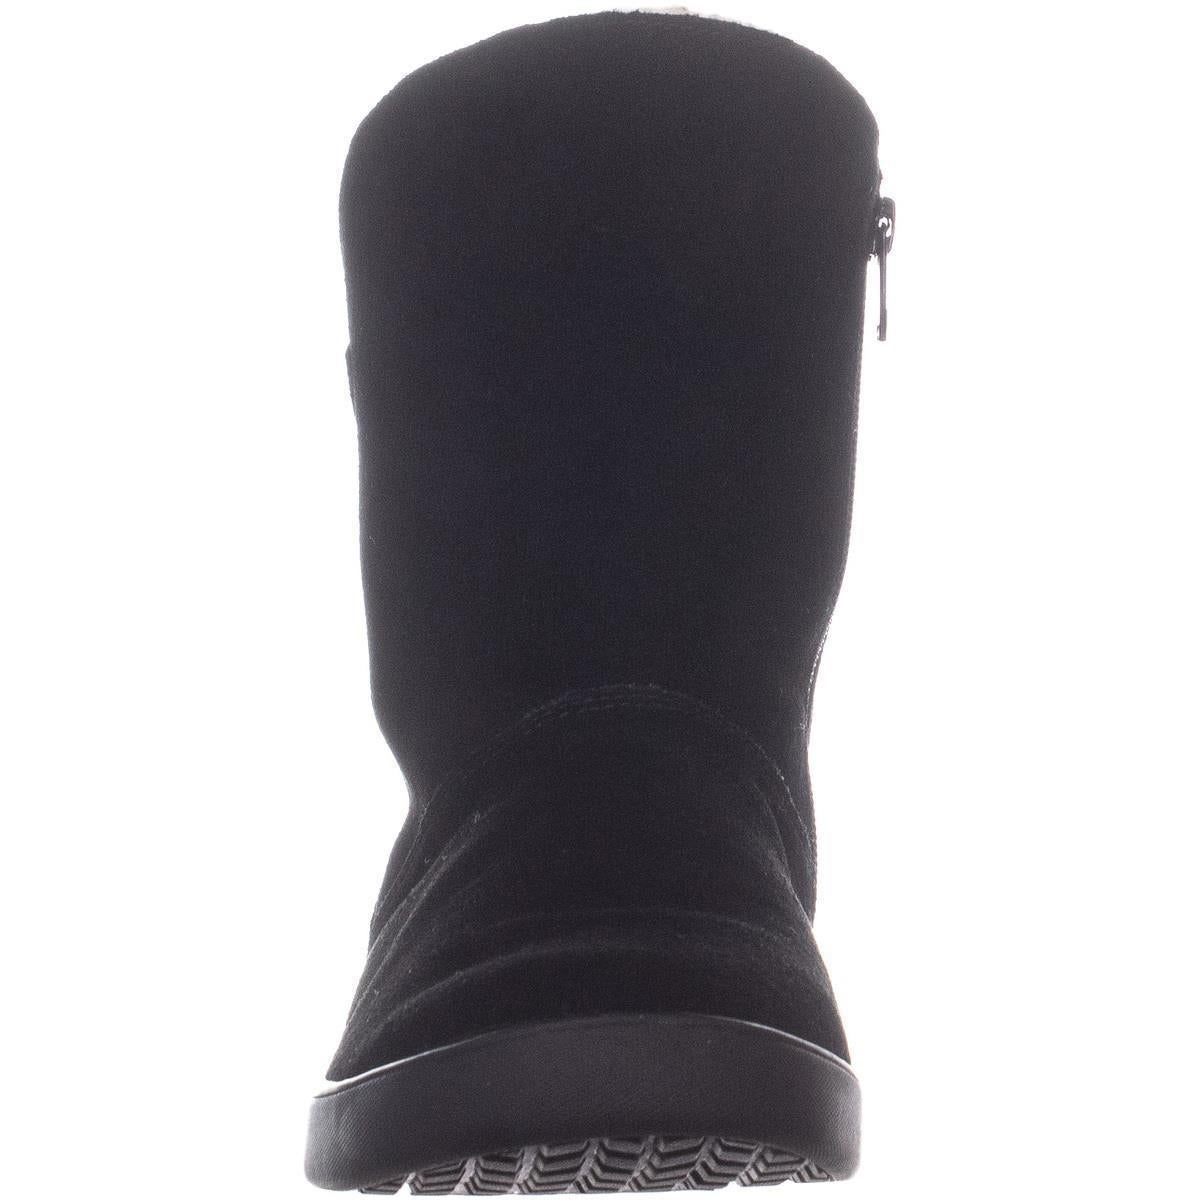 2270748027f Koolaburra by UGG Shazi Short Mid Calf Boots, Black